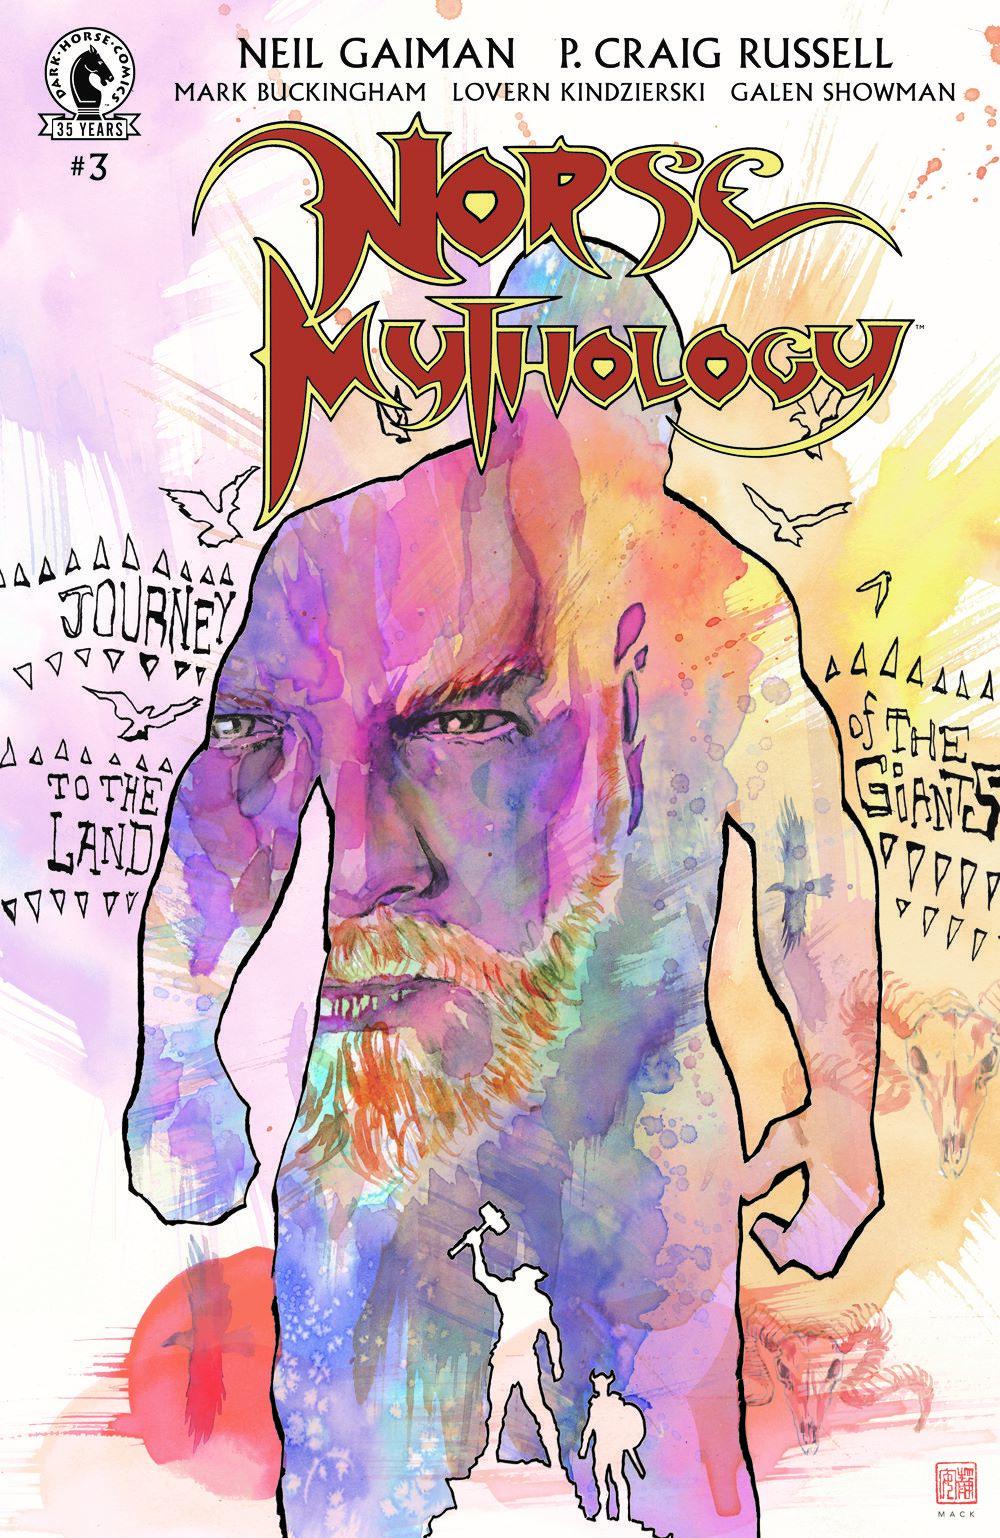 NMYTH2_i3_CVR_VAR_B_MACK_4x6_SOL-1 Dark Horse Comics August 2021 Solicitations